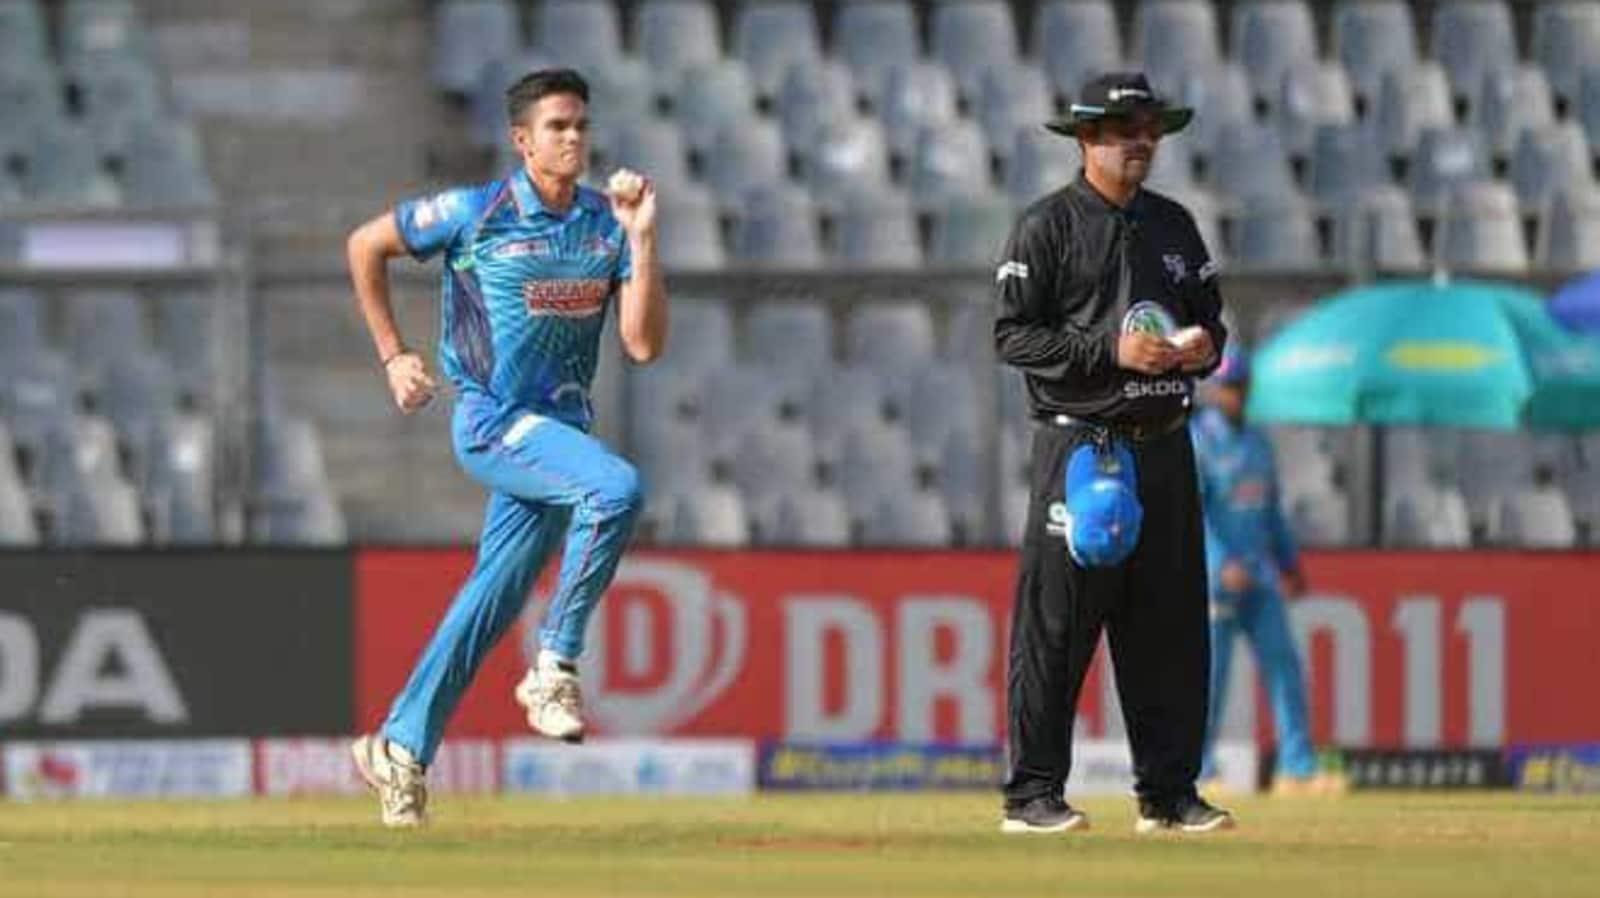 Arjun Tendulkar registers for IPL 2021 auction - Hindustan ...